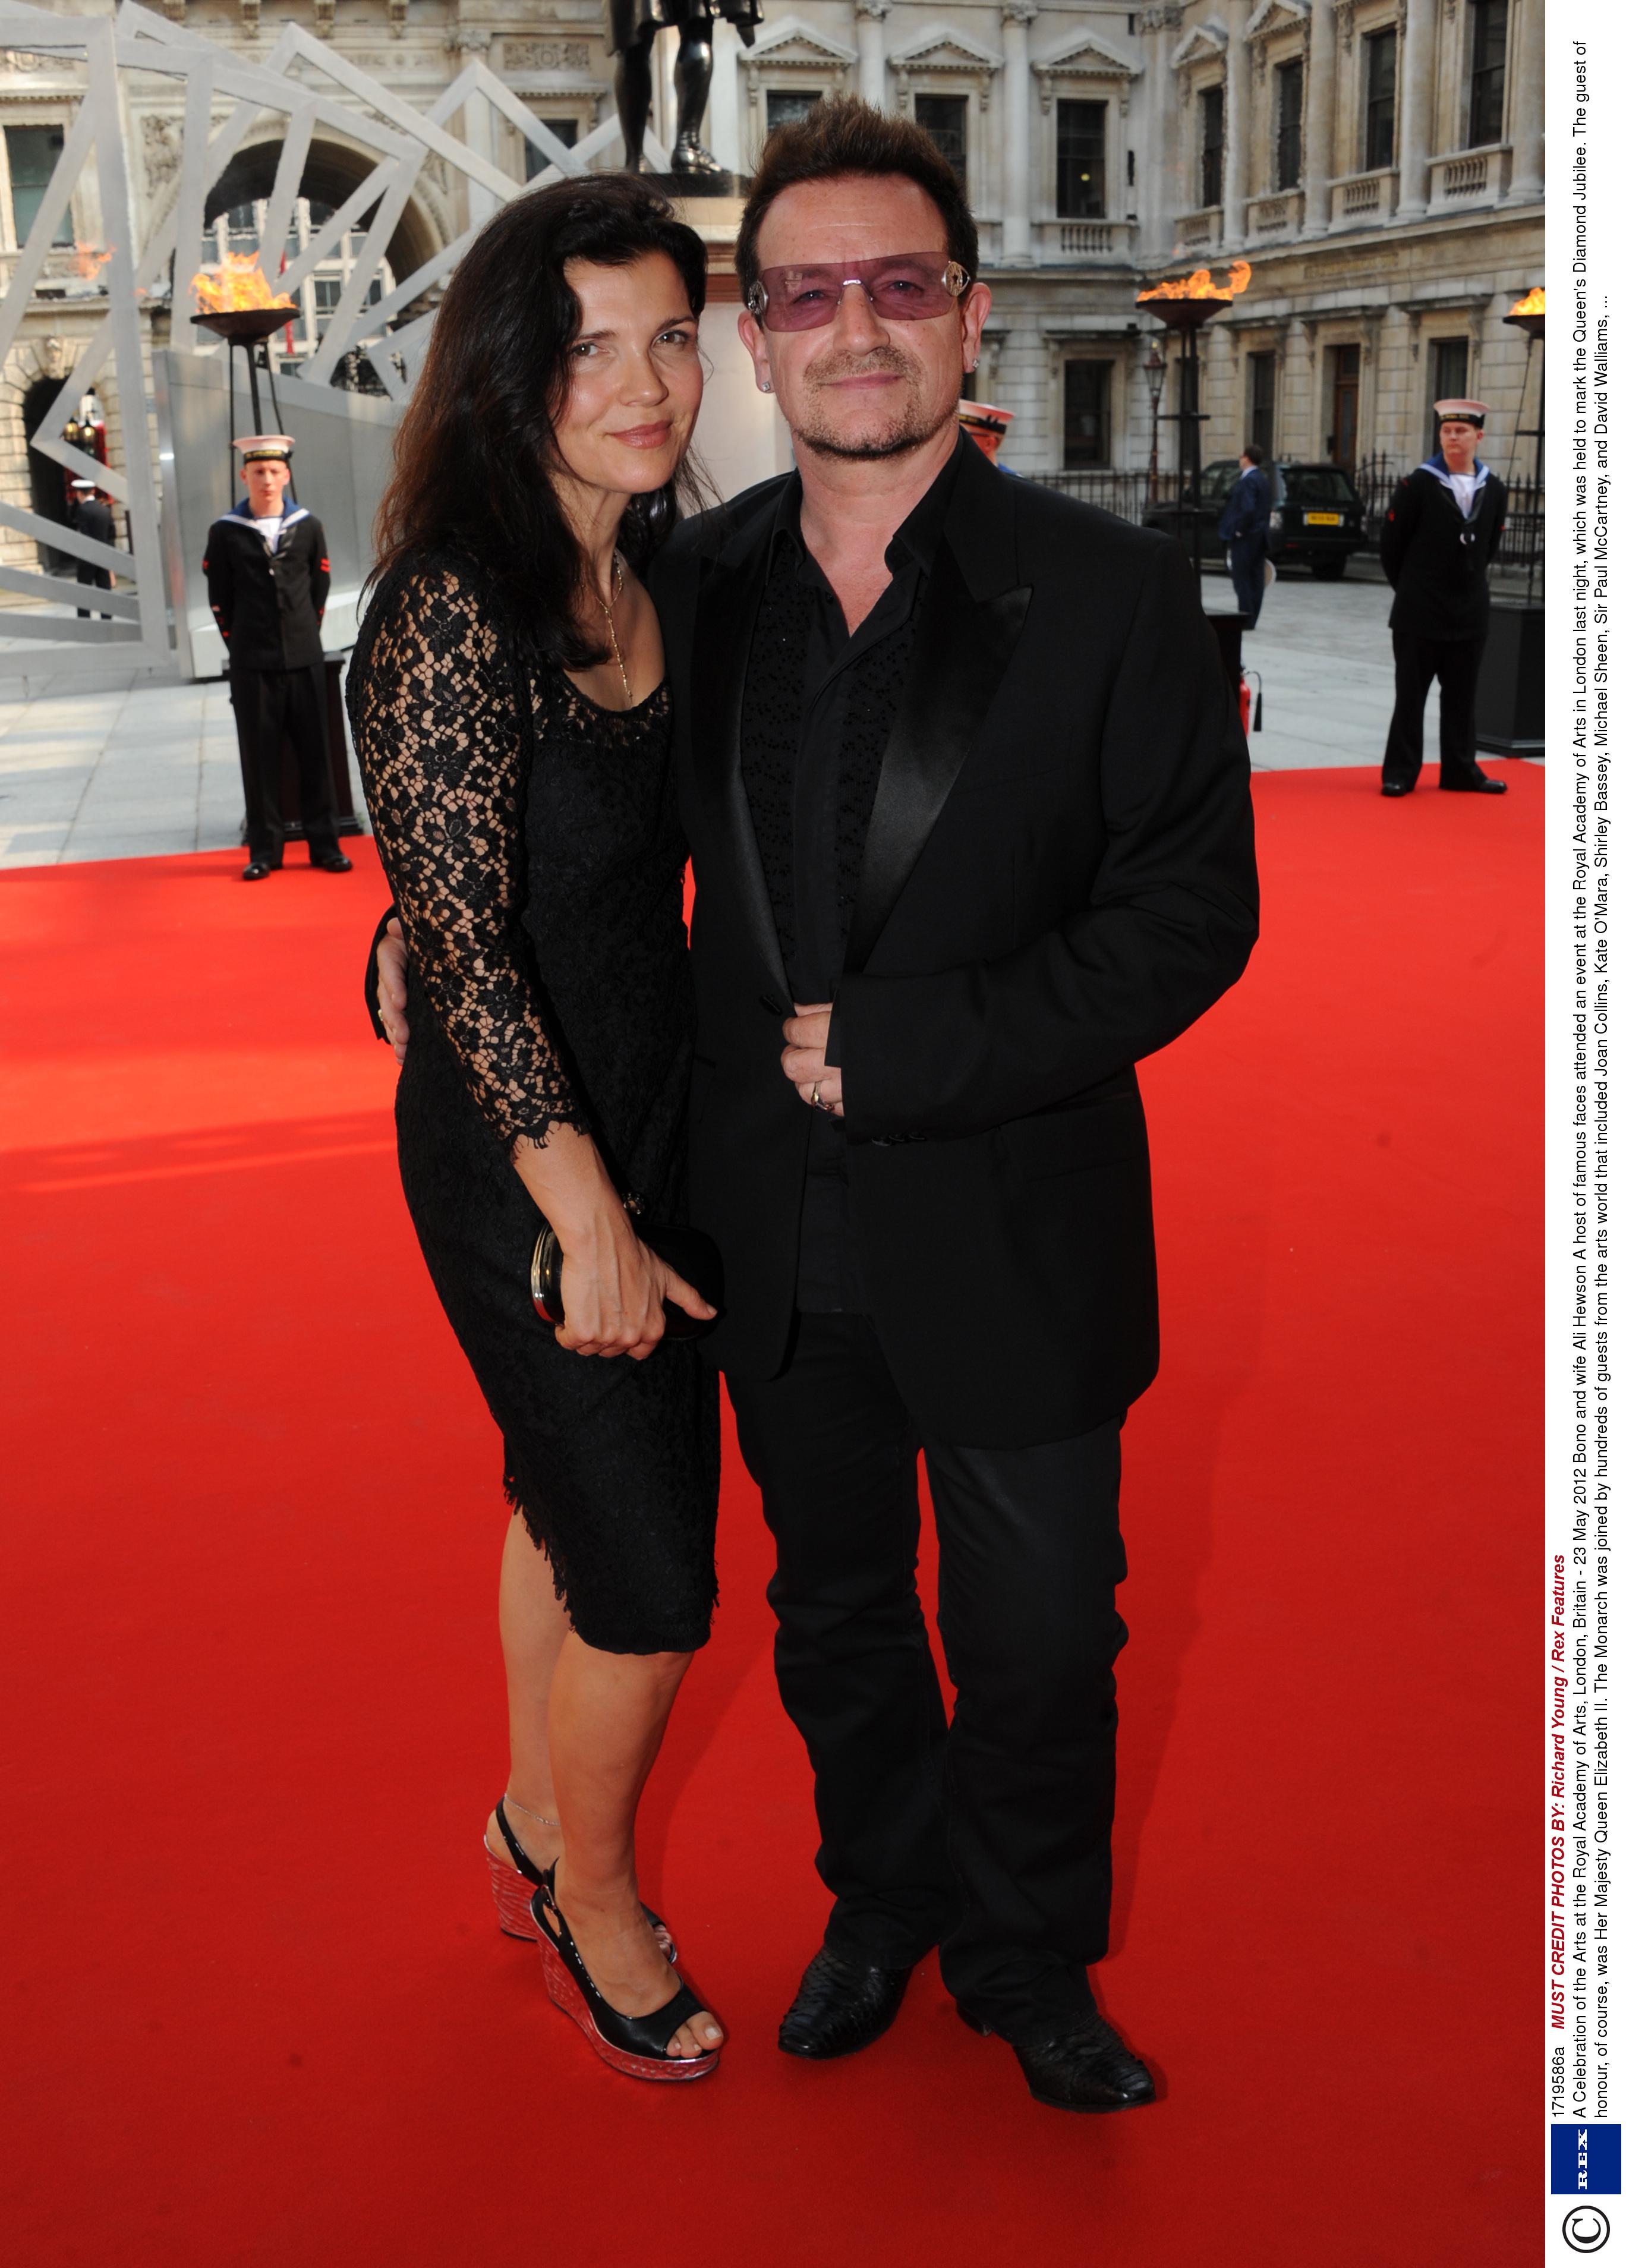 Bono records Lady GaGa hit for daughter